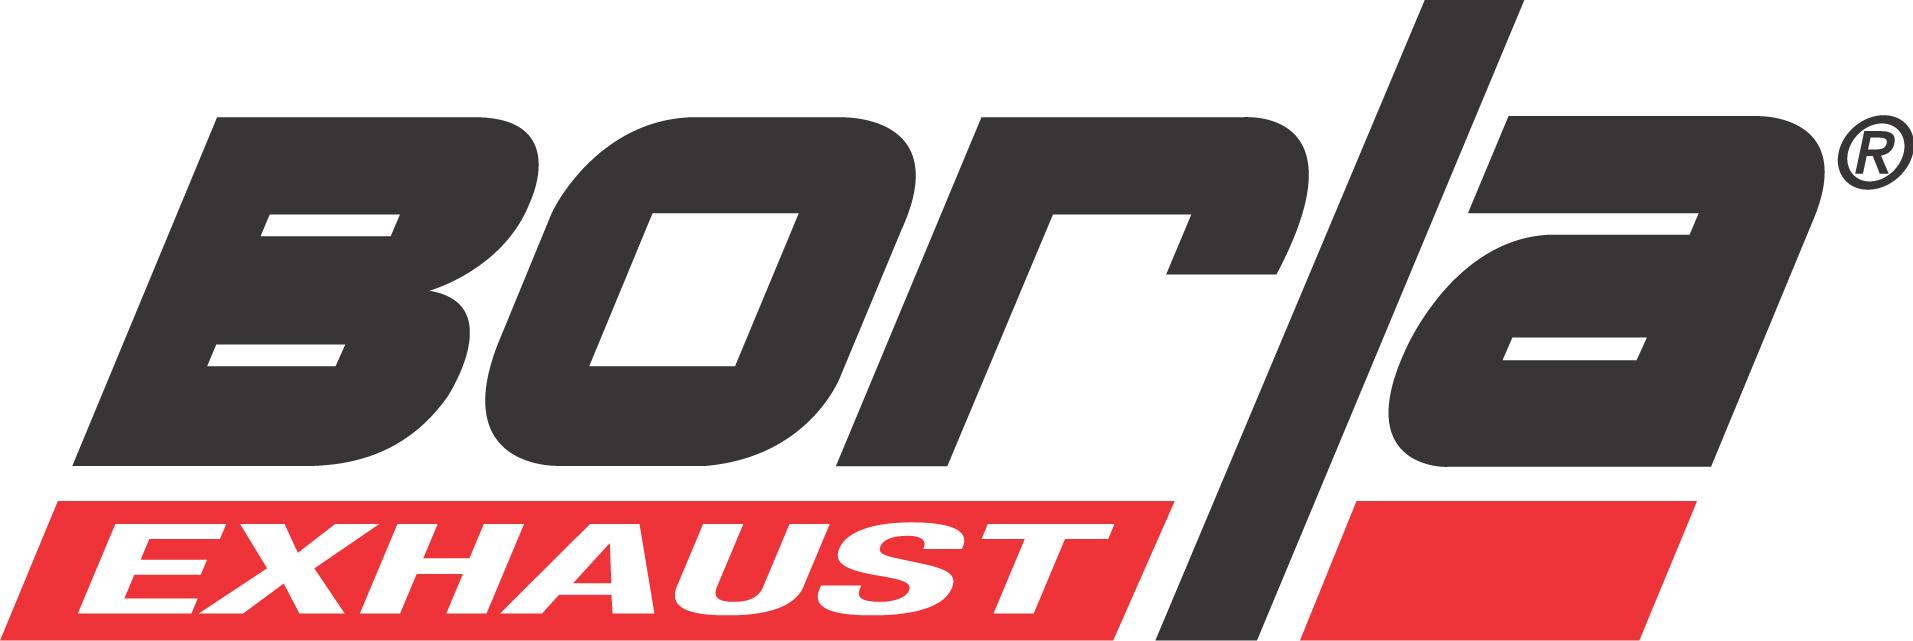 Corvette Exhaust Systems From Corsa B Amp B Borla Amp More